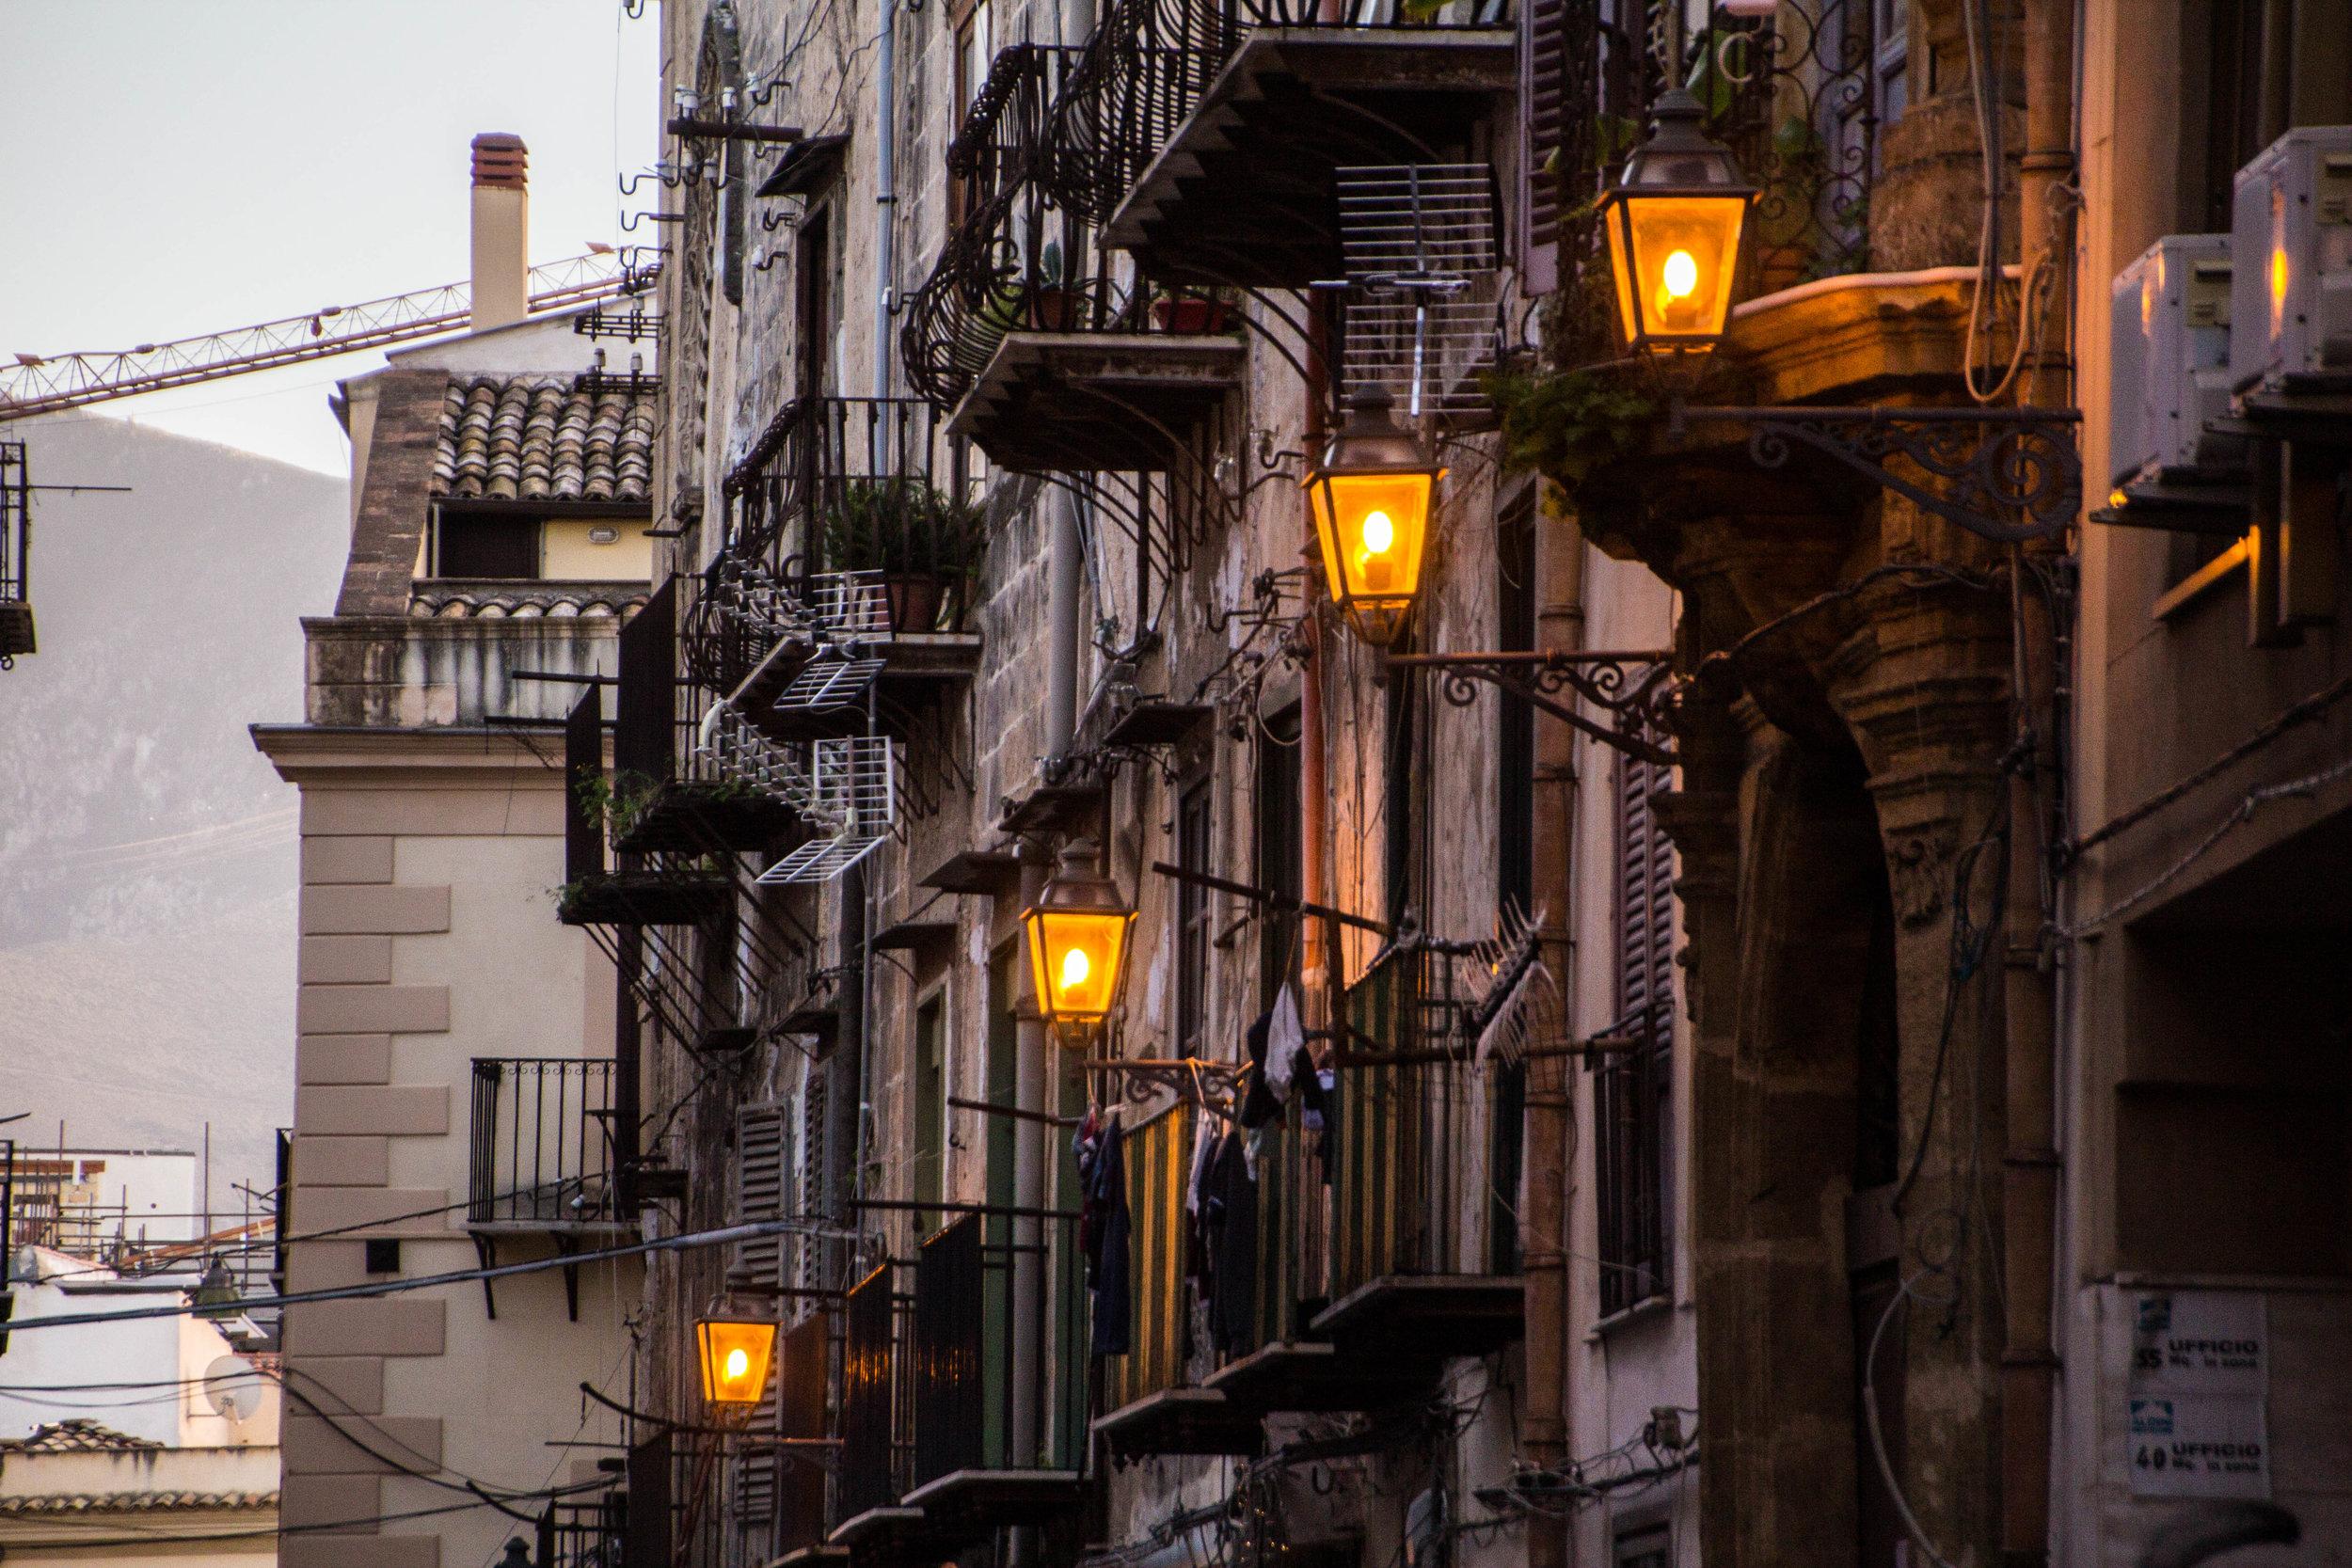 streets-palermo-sicily-25.jpg